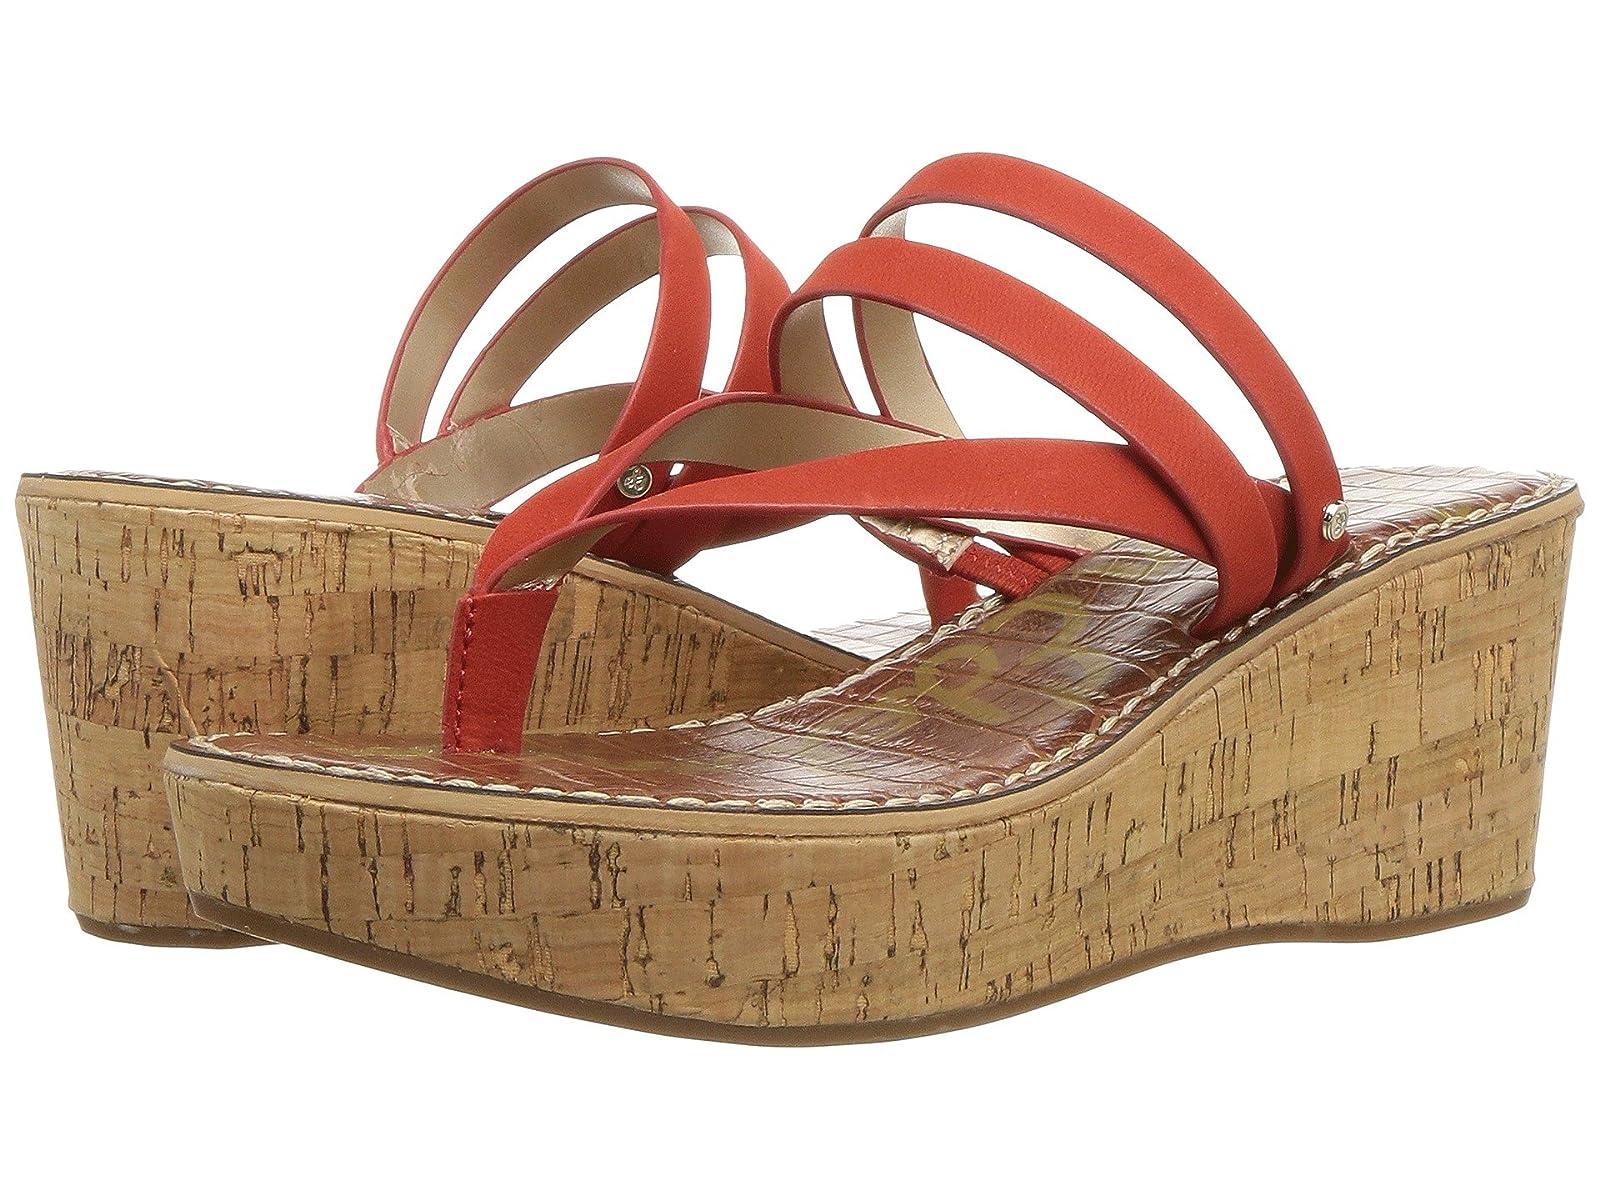 Sam Edelman RashaAtmospheric grades have affordable shoes